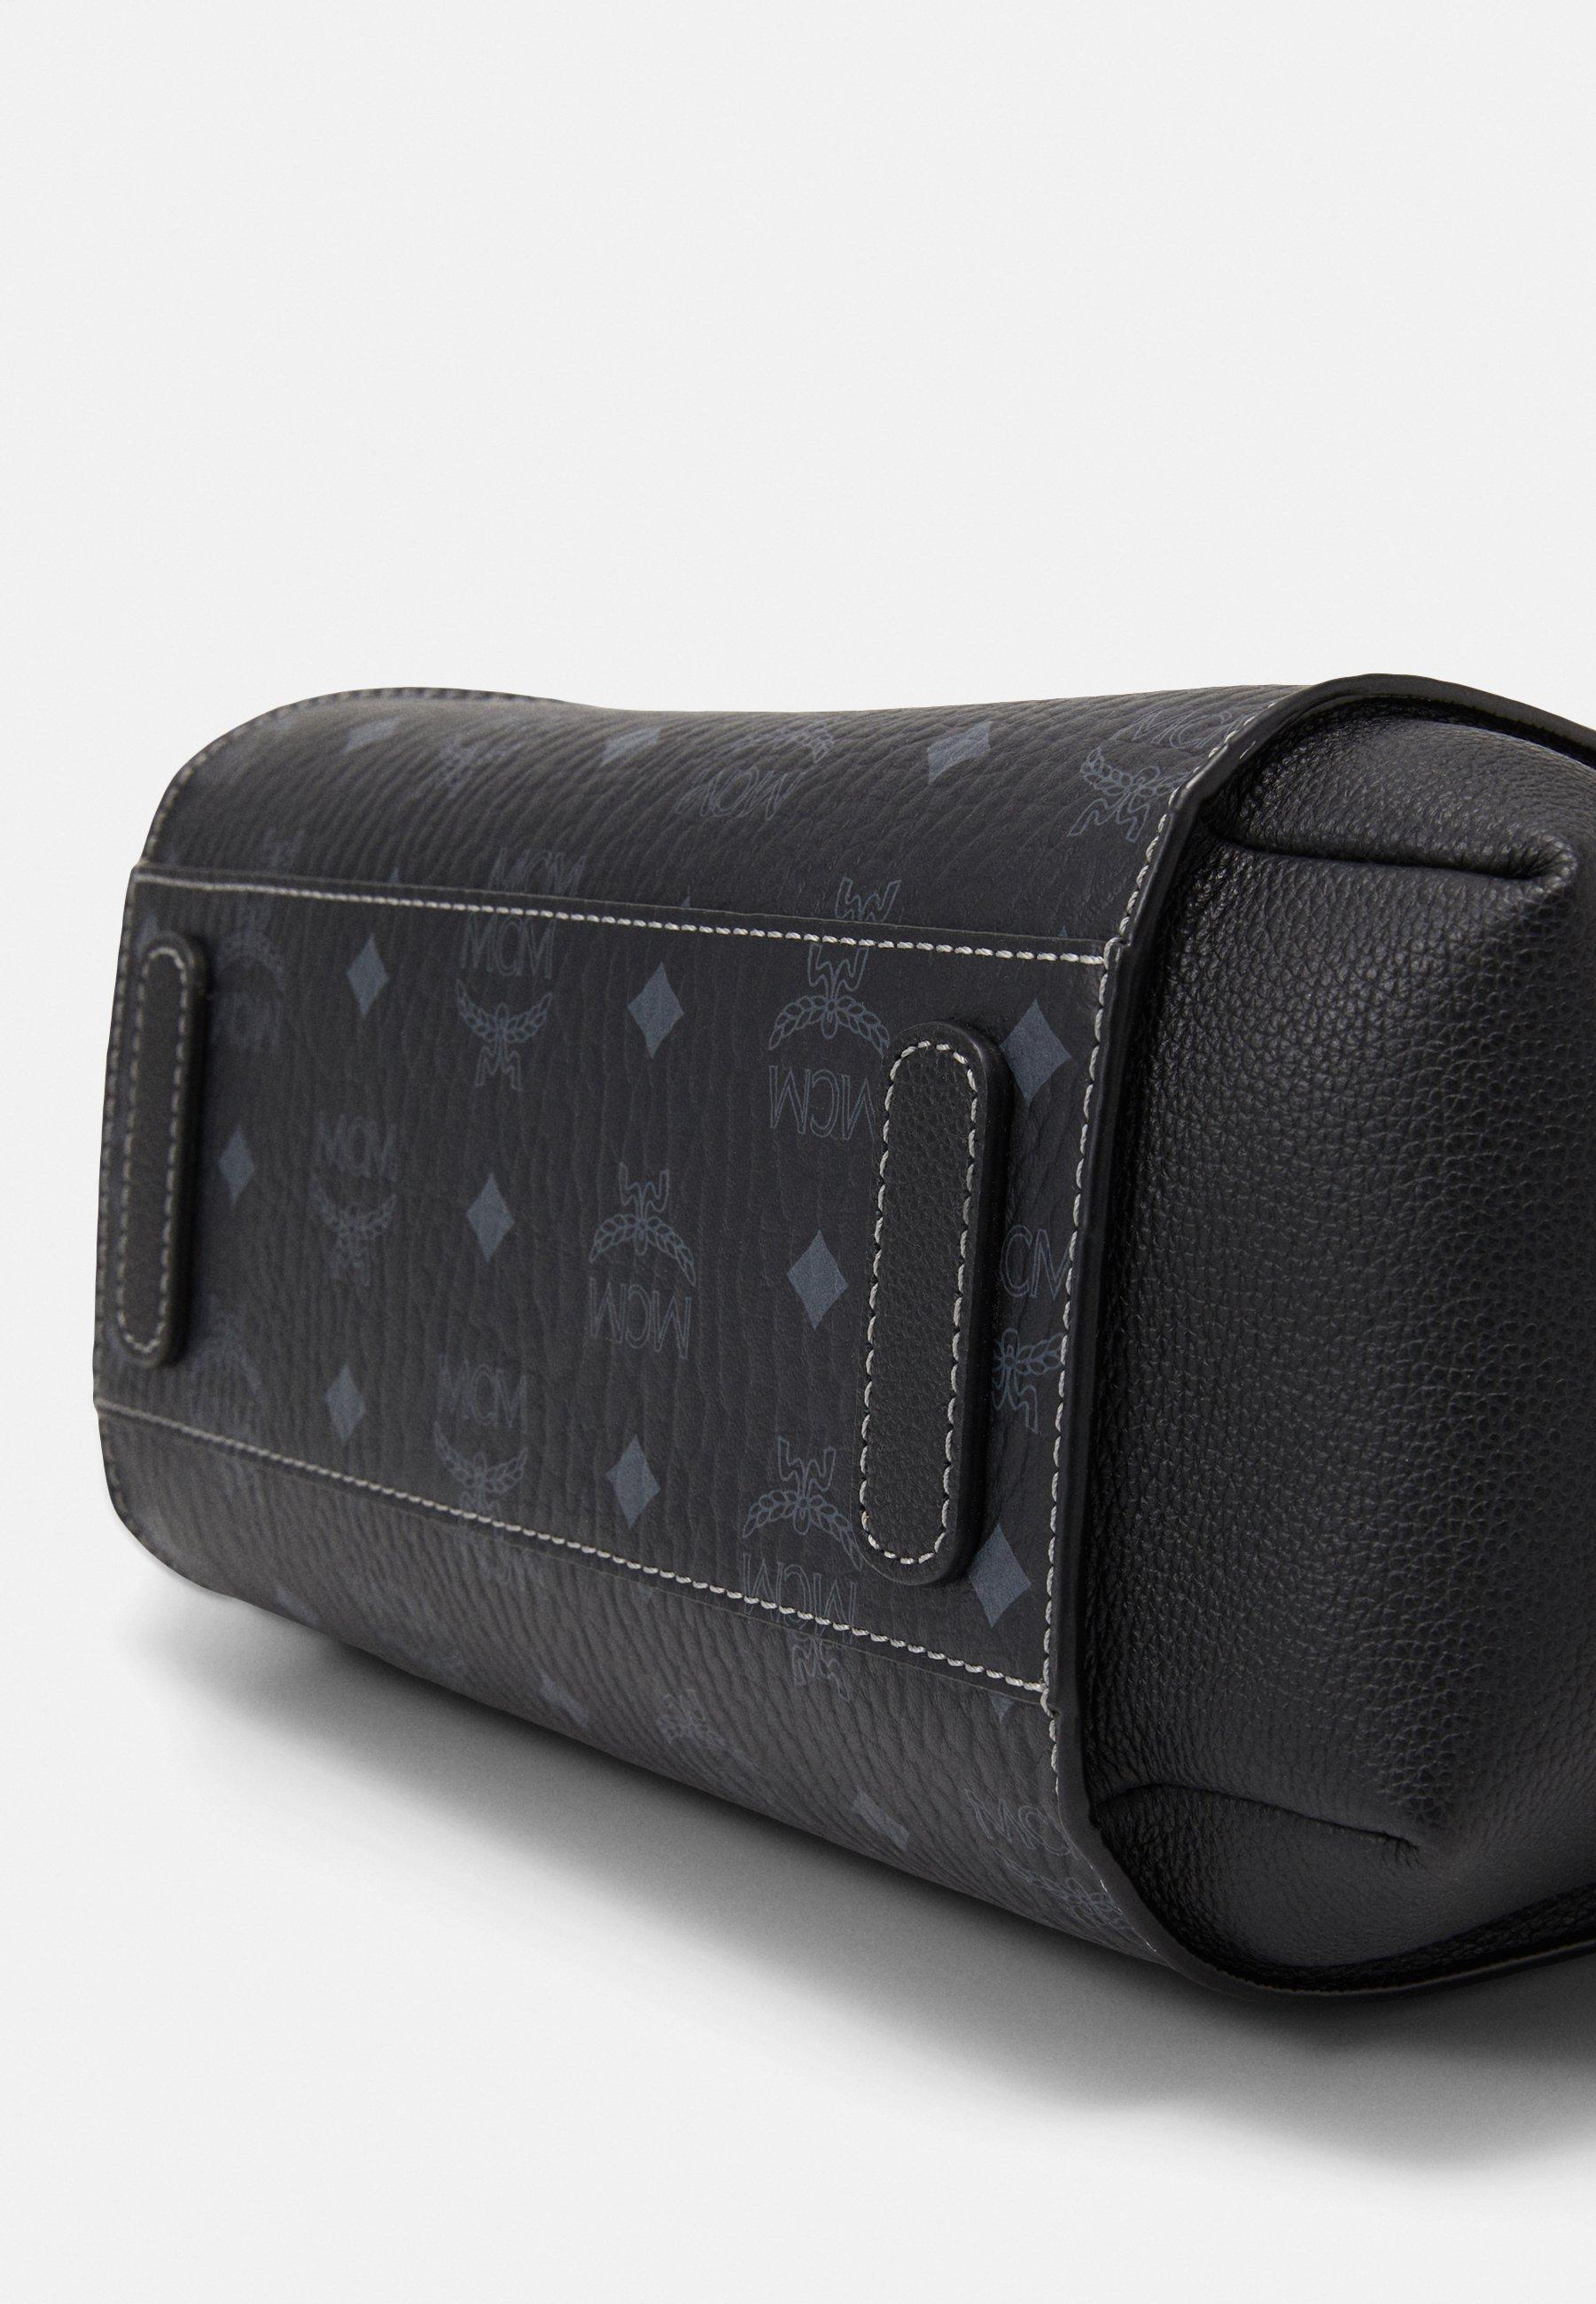 MCM LUISA - Håndveske - black/svart DFH1ax0zvkvrPhJ